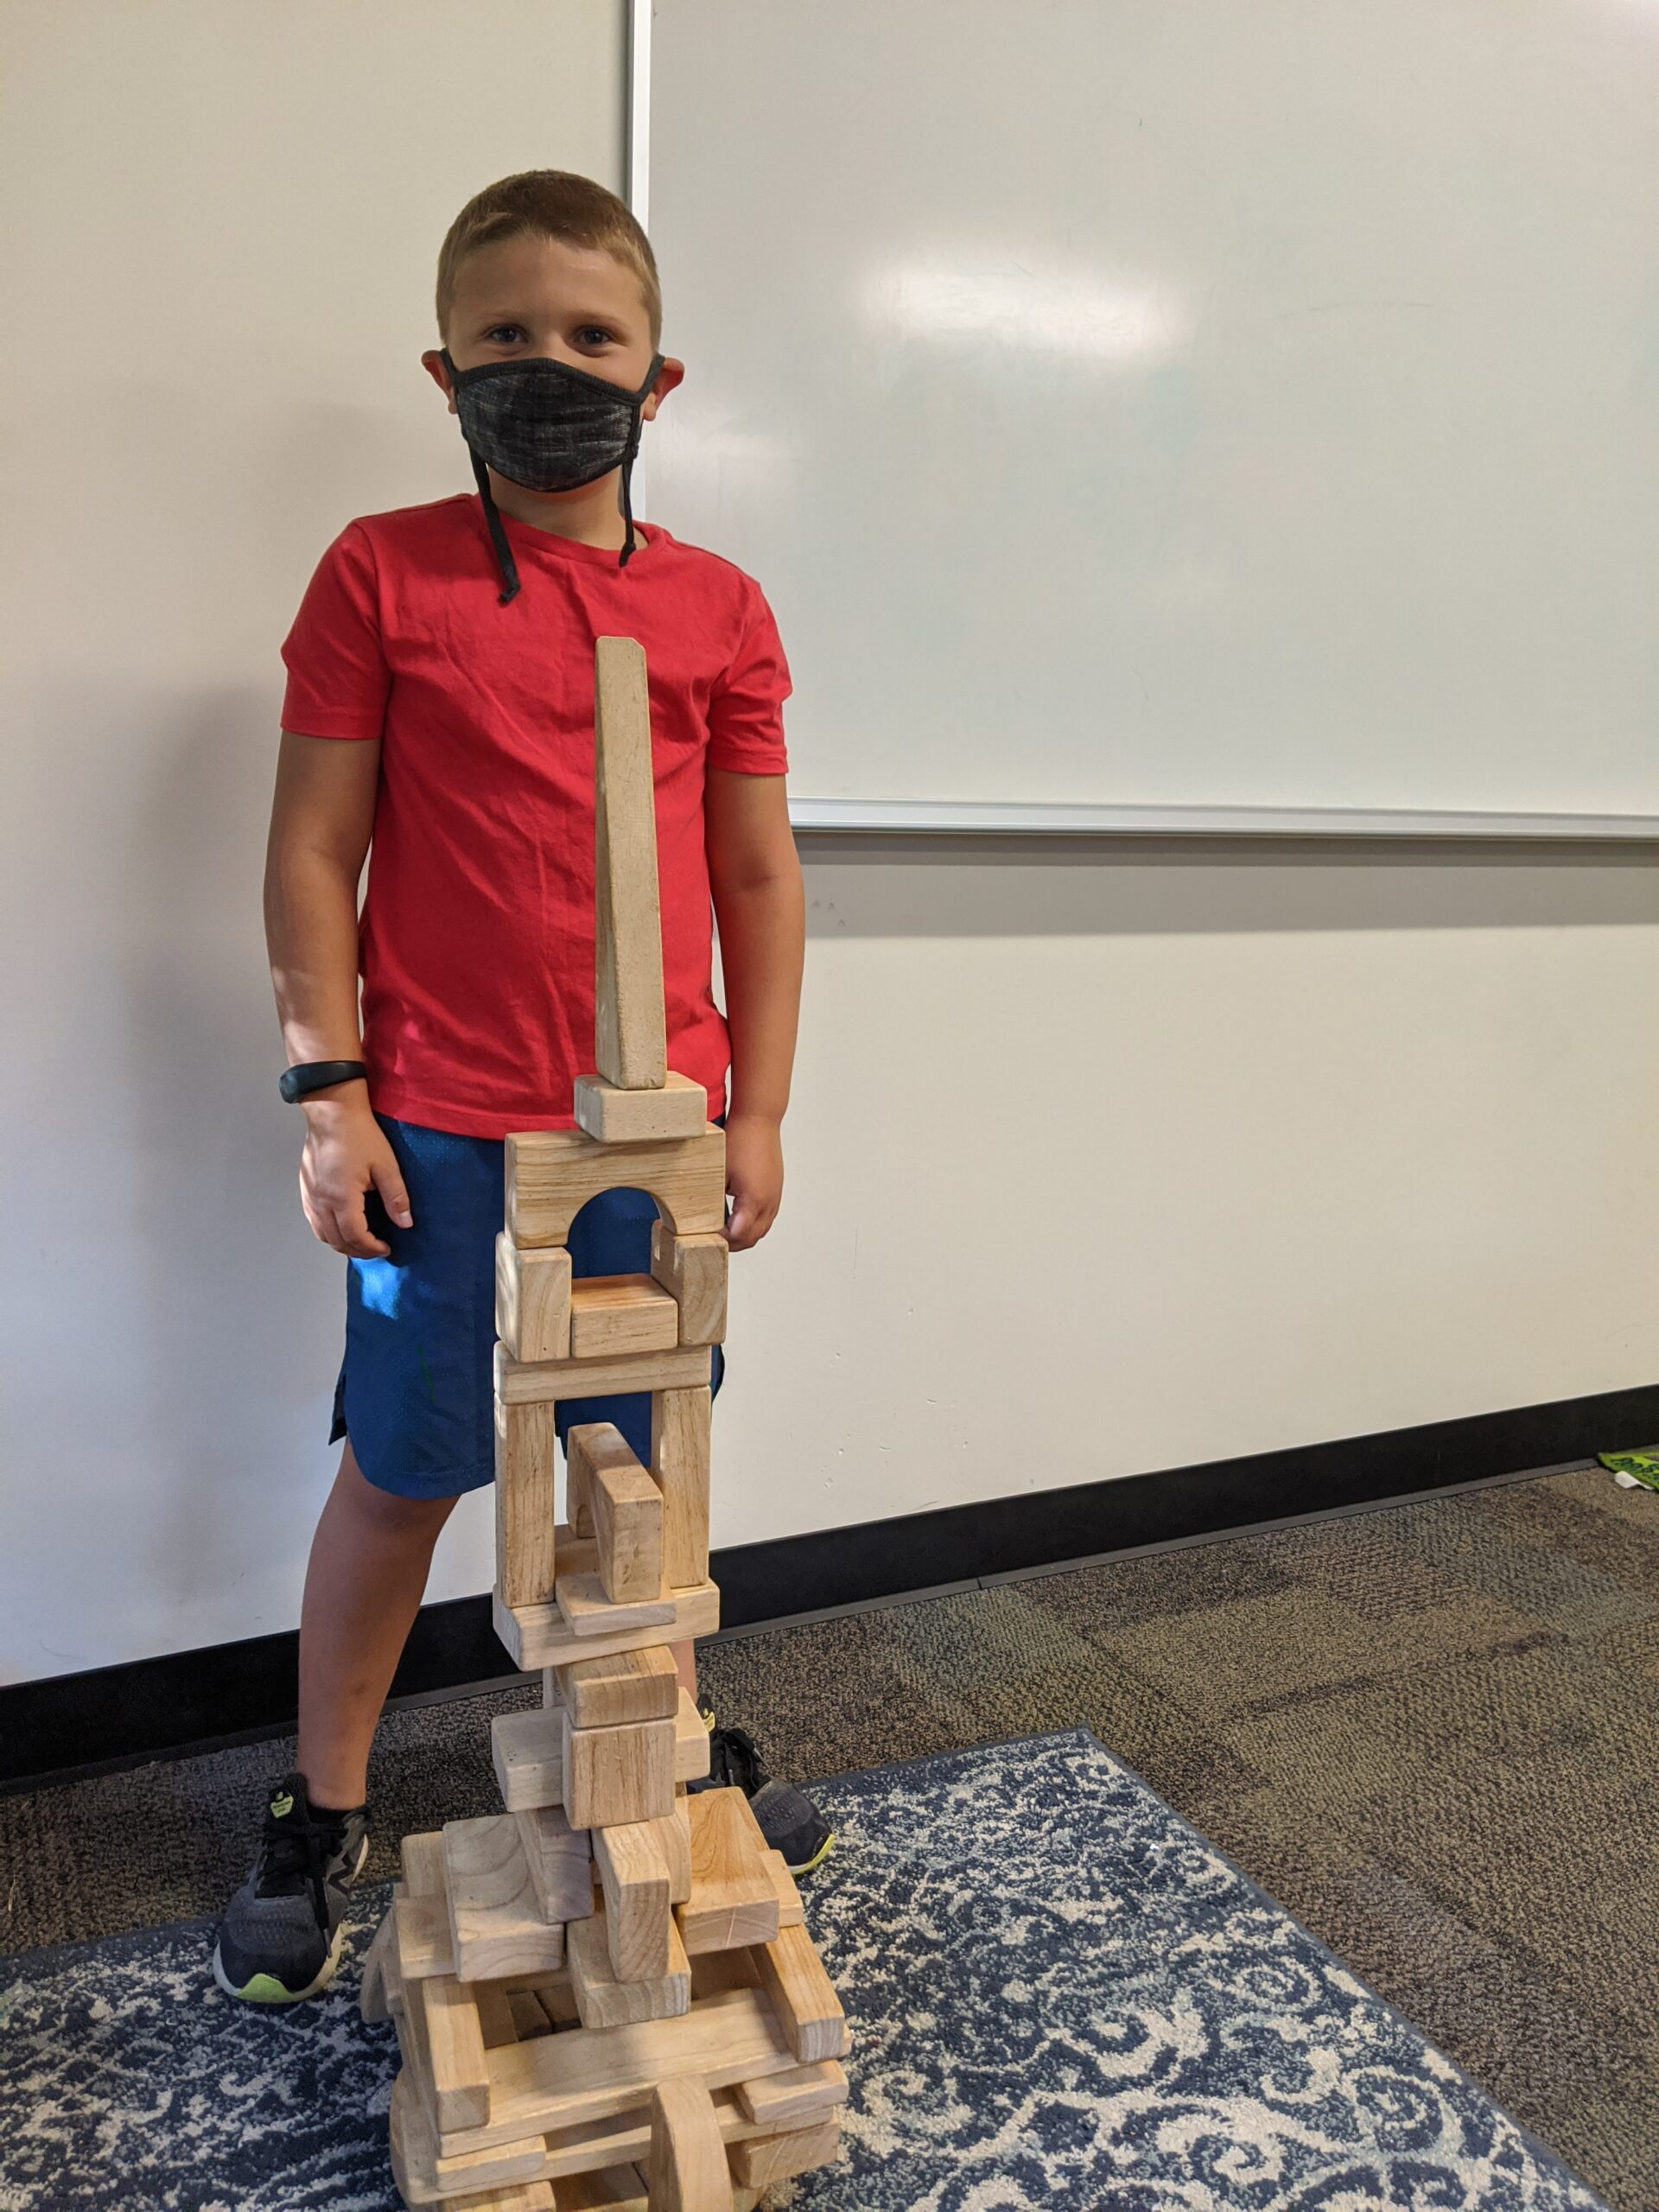 Balancing tower